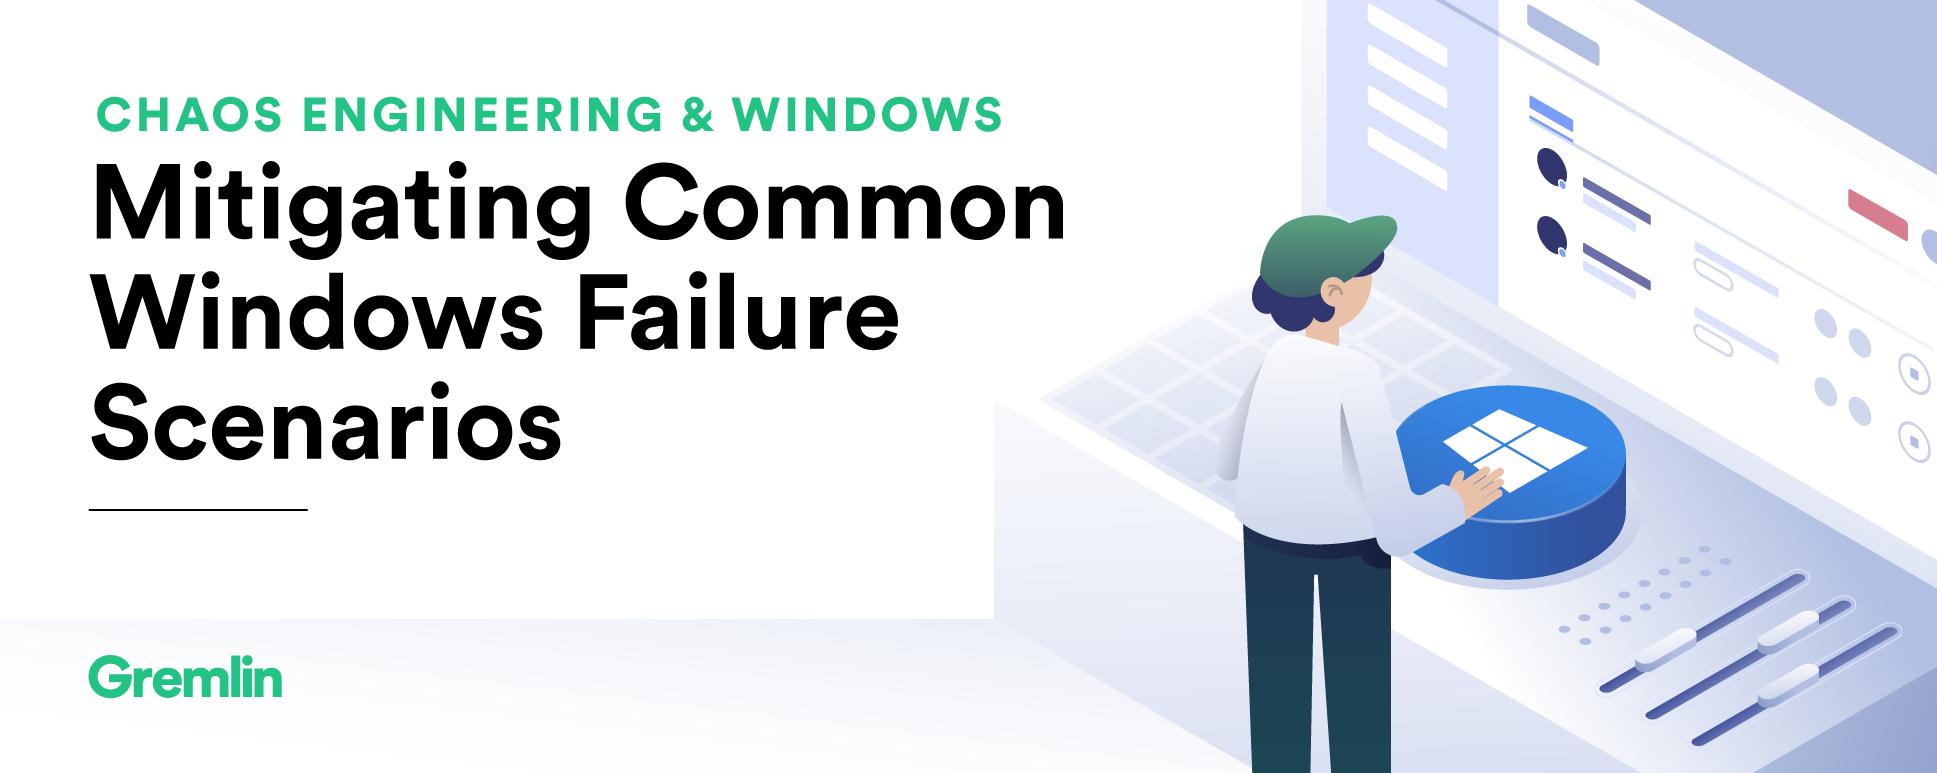 Chaos Engineering and Windows: Mitigating common Windows failure scenarios